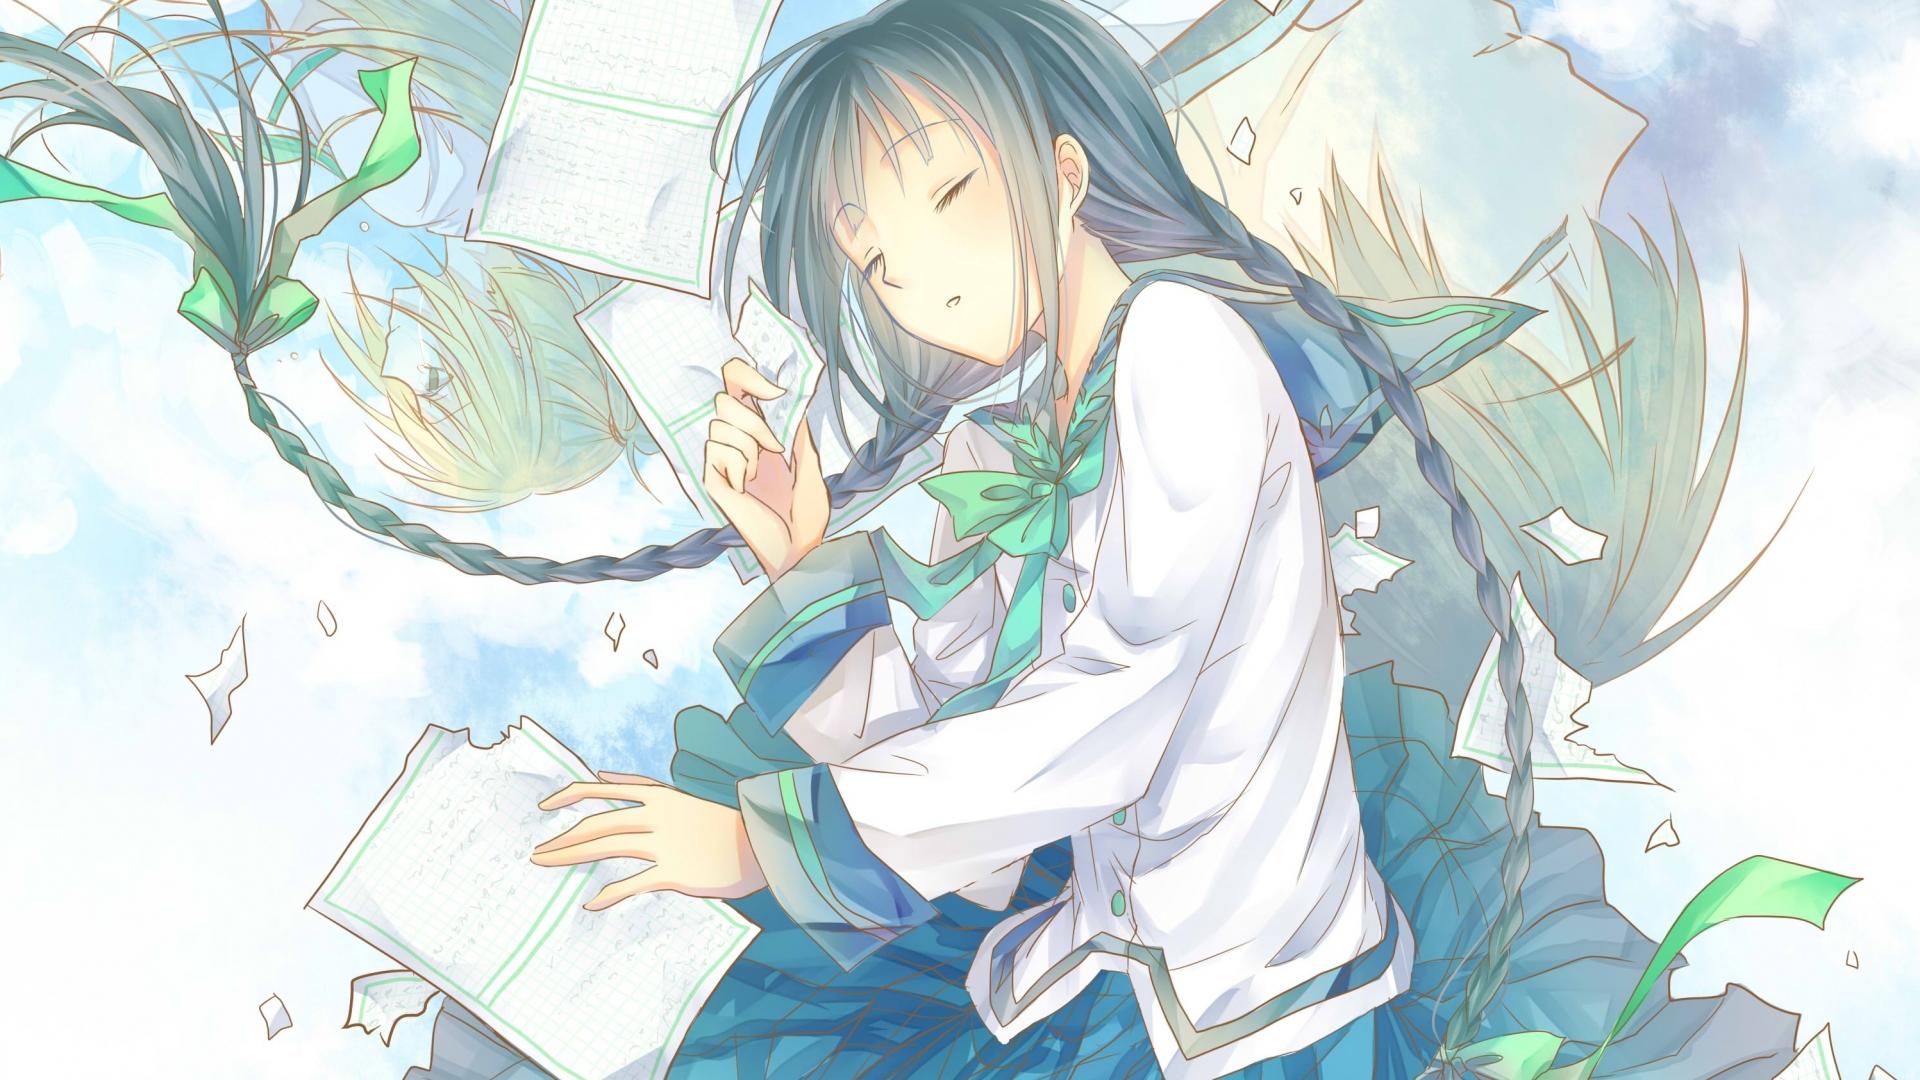 Download 1920x1080 wallpaper sleep cute anime girl - Cute anime girl wallpaper download ...